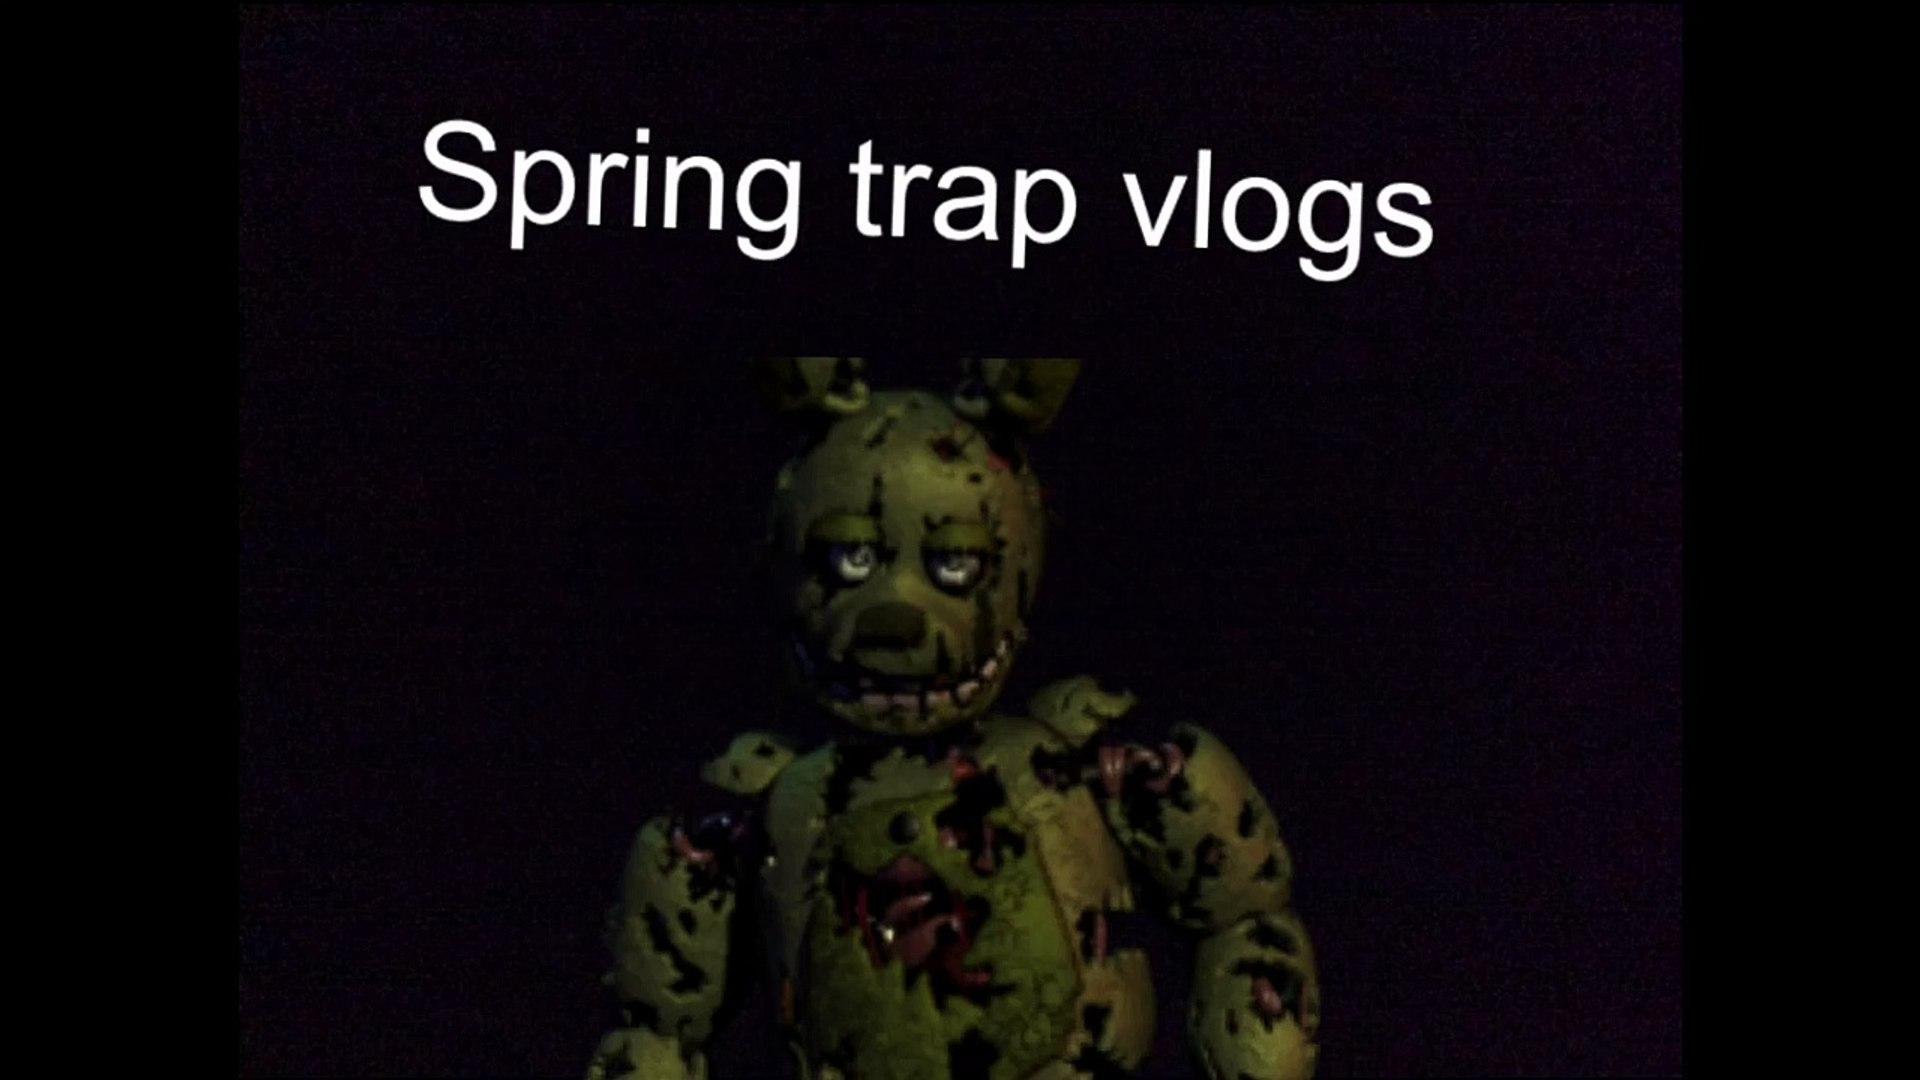 spring trap vlogs intro